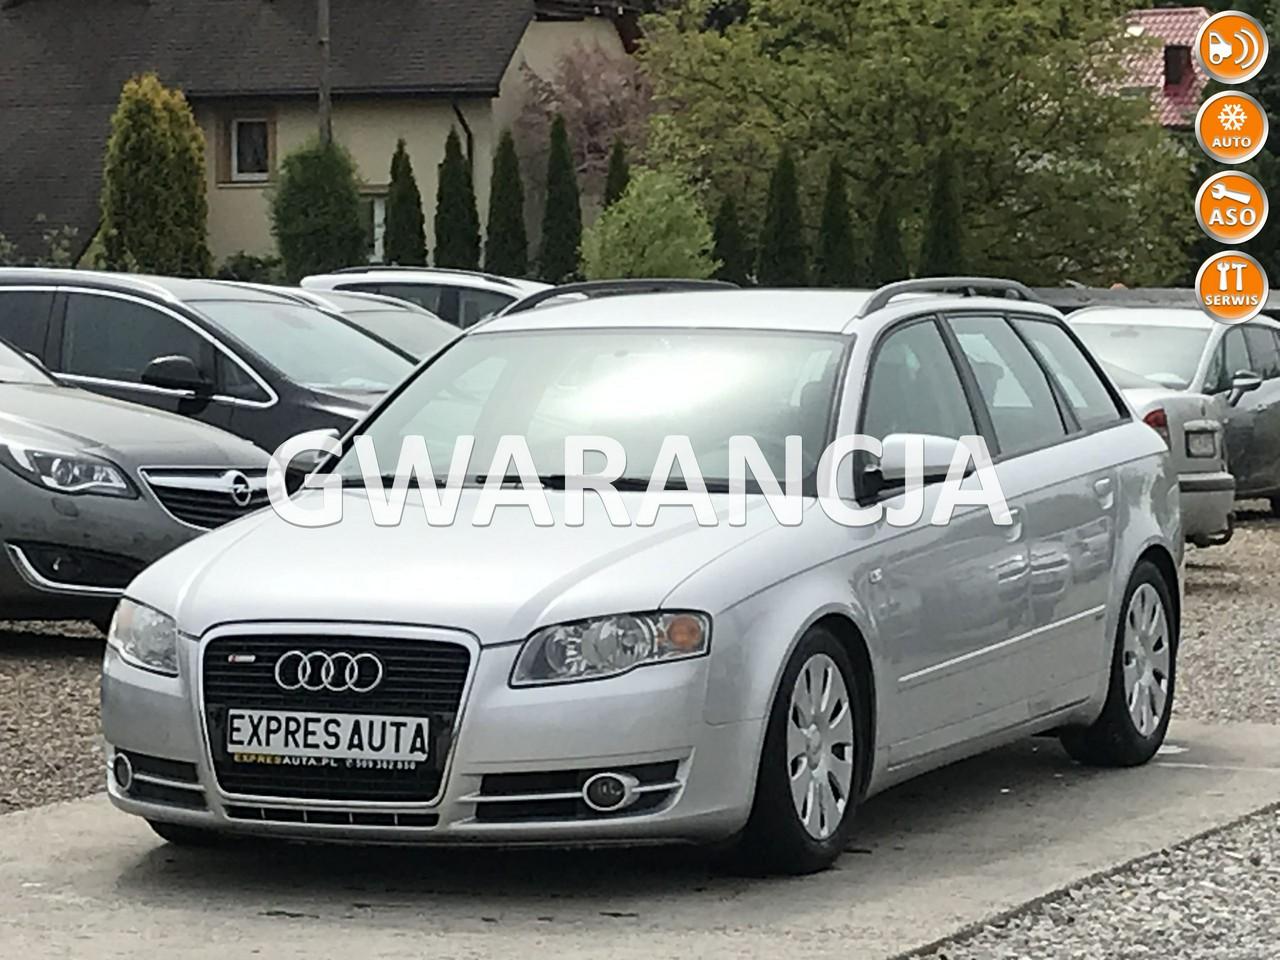 Audi A4 Kombi 19 Tdi S Line Serwisy Gwarancja Expresautapl